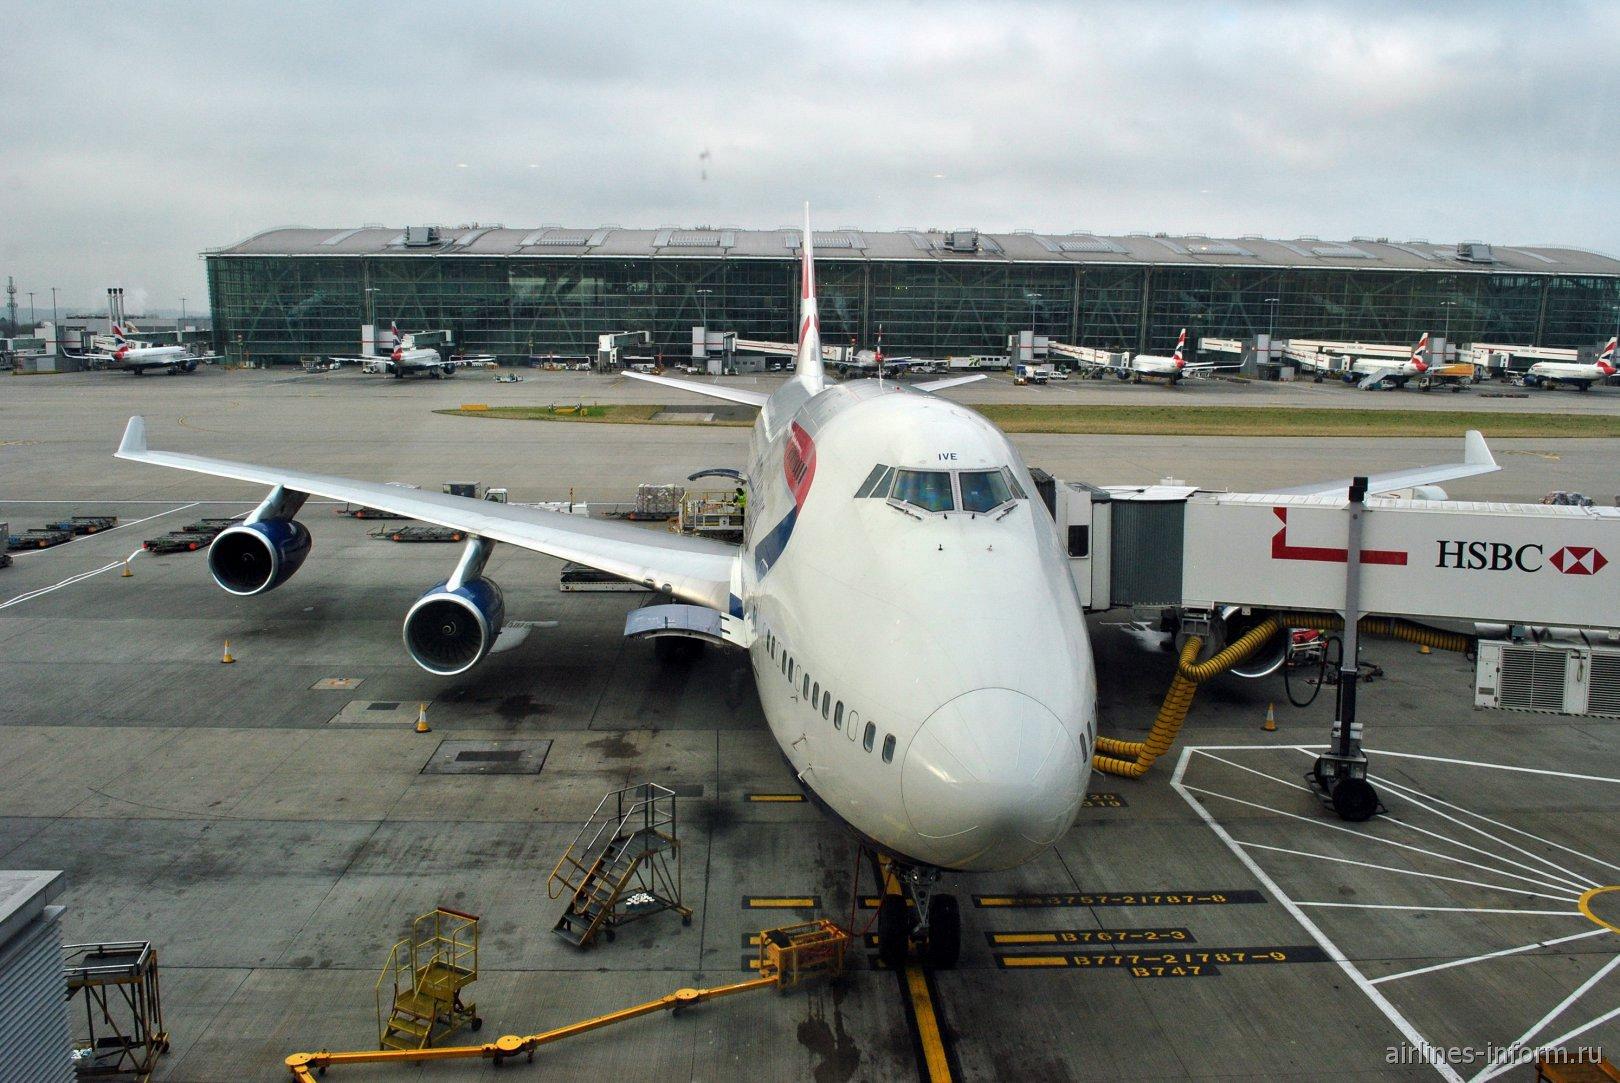 Боинг-747-400 Британских авиалинии у терминала 5 аэропорта Лондон Хитроу